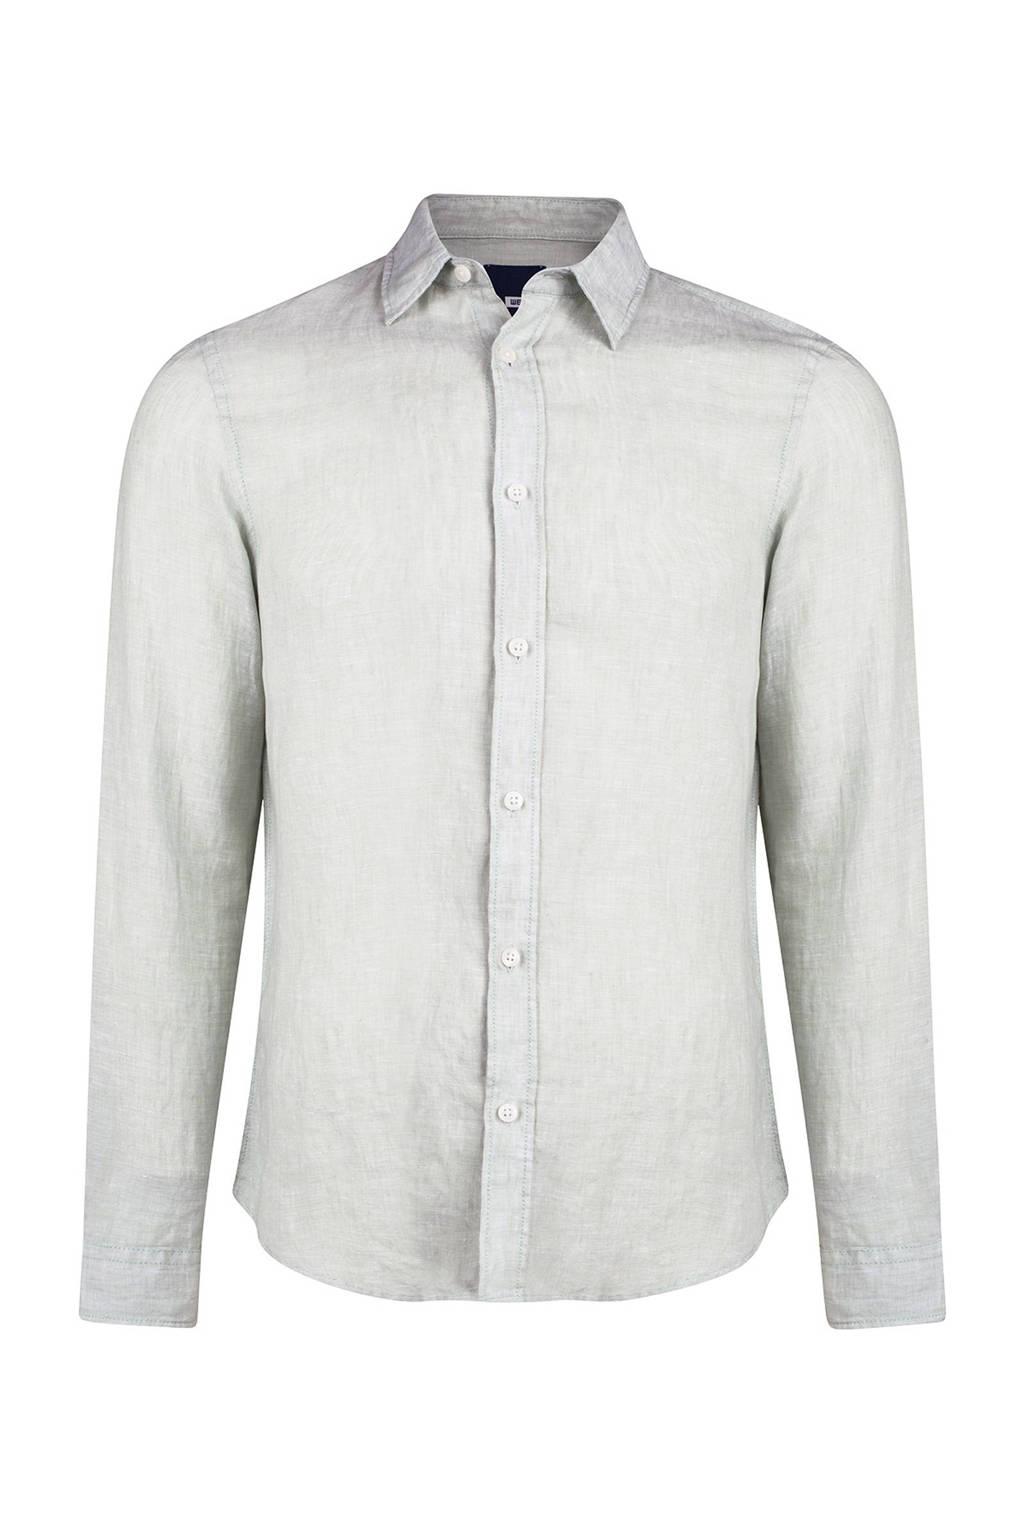 WE Fashion linnen slim fit overhemd mintgrijs, Mintgrijs